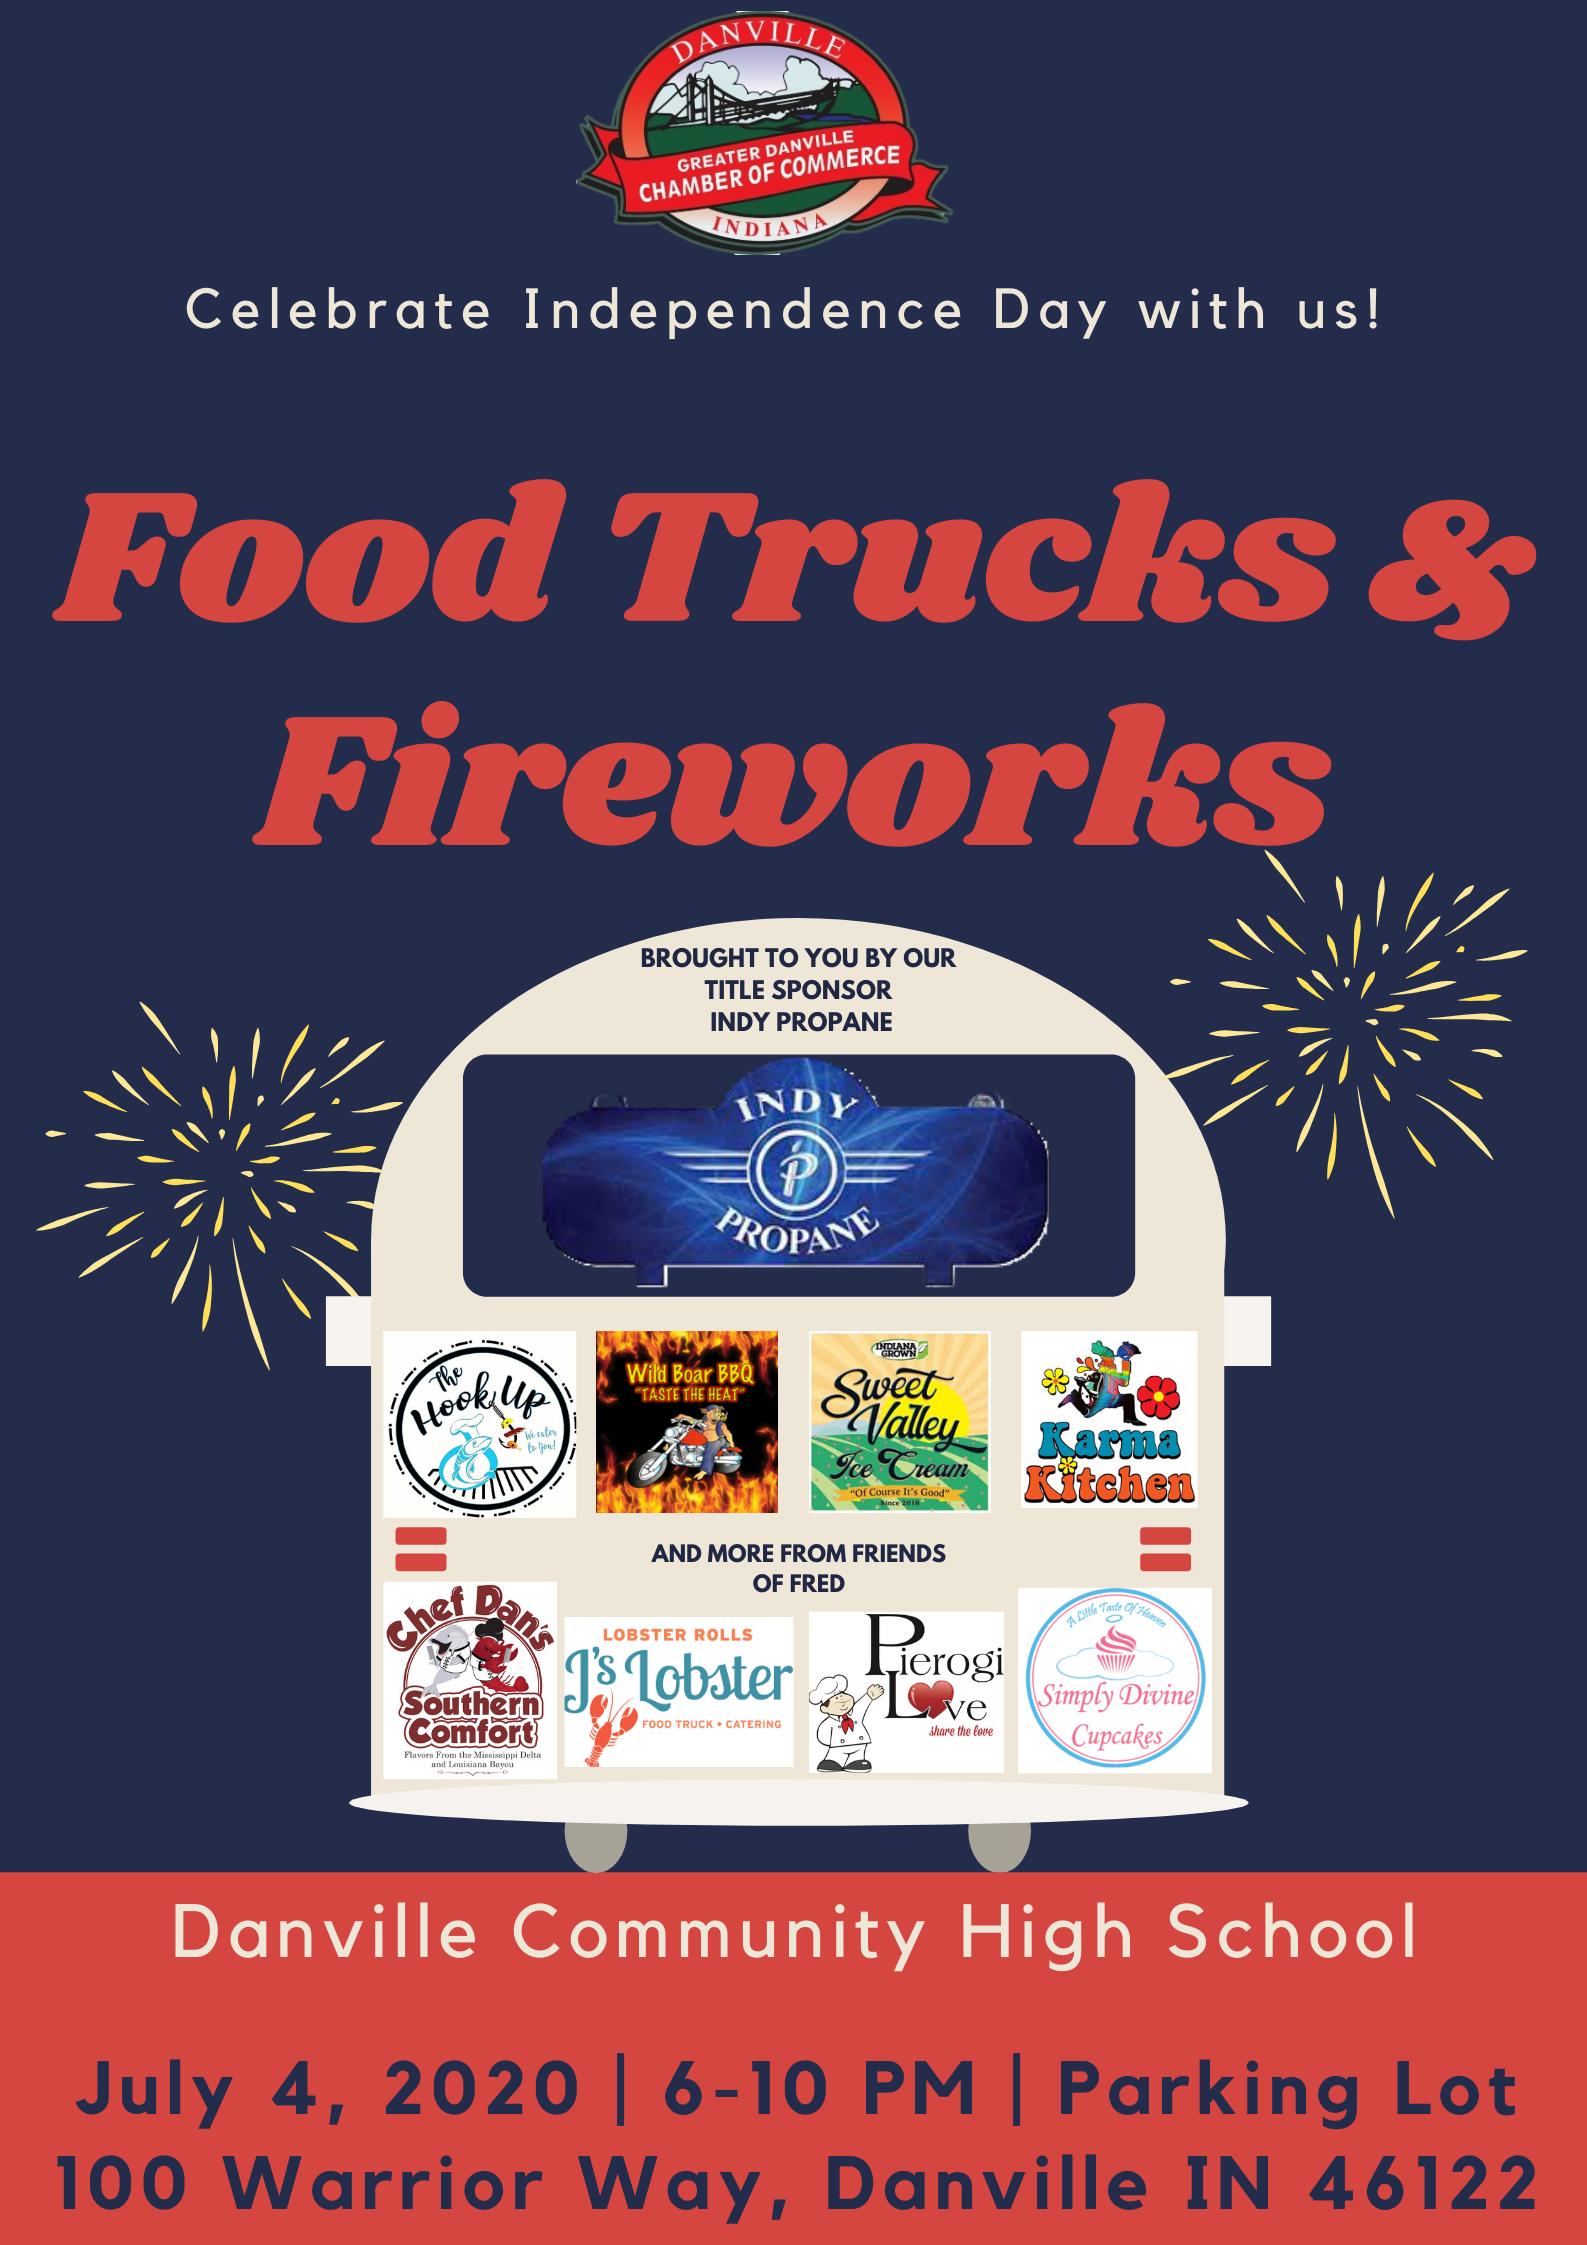 Food Trucks and Fireworks